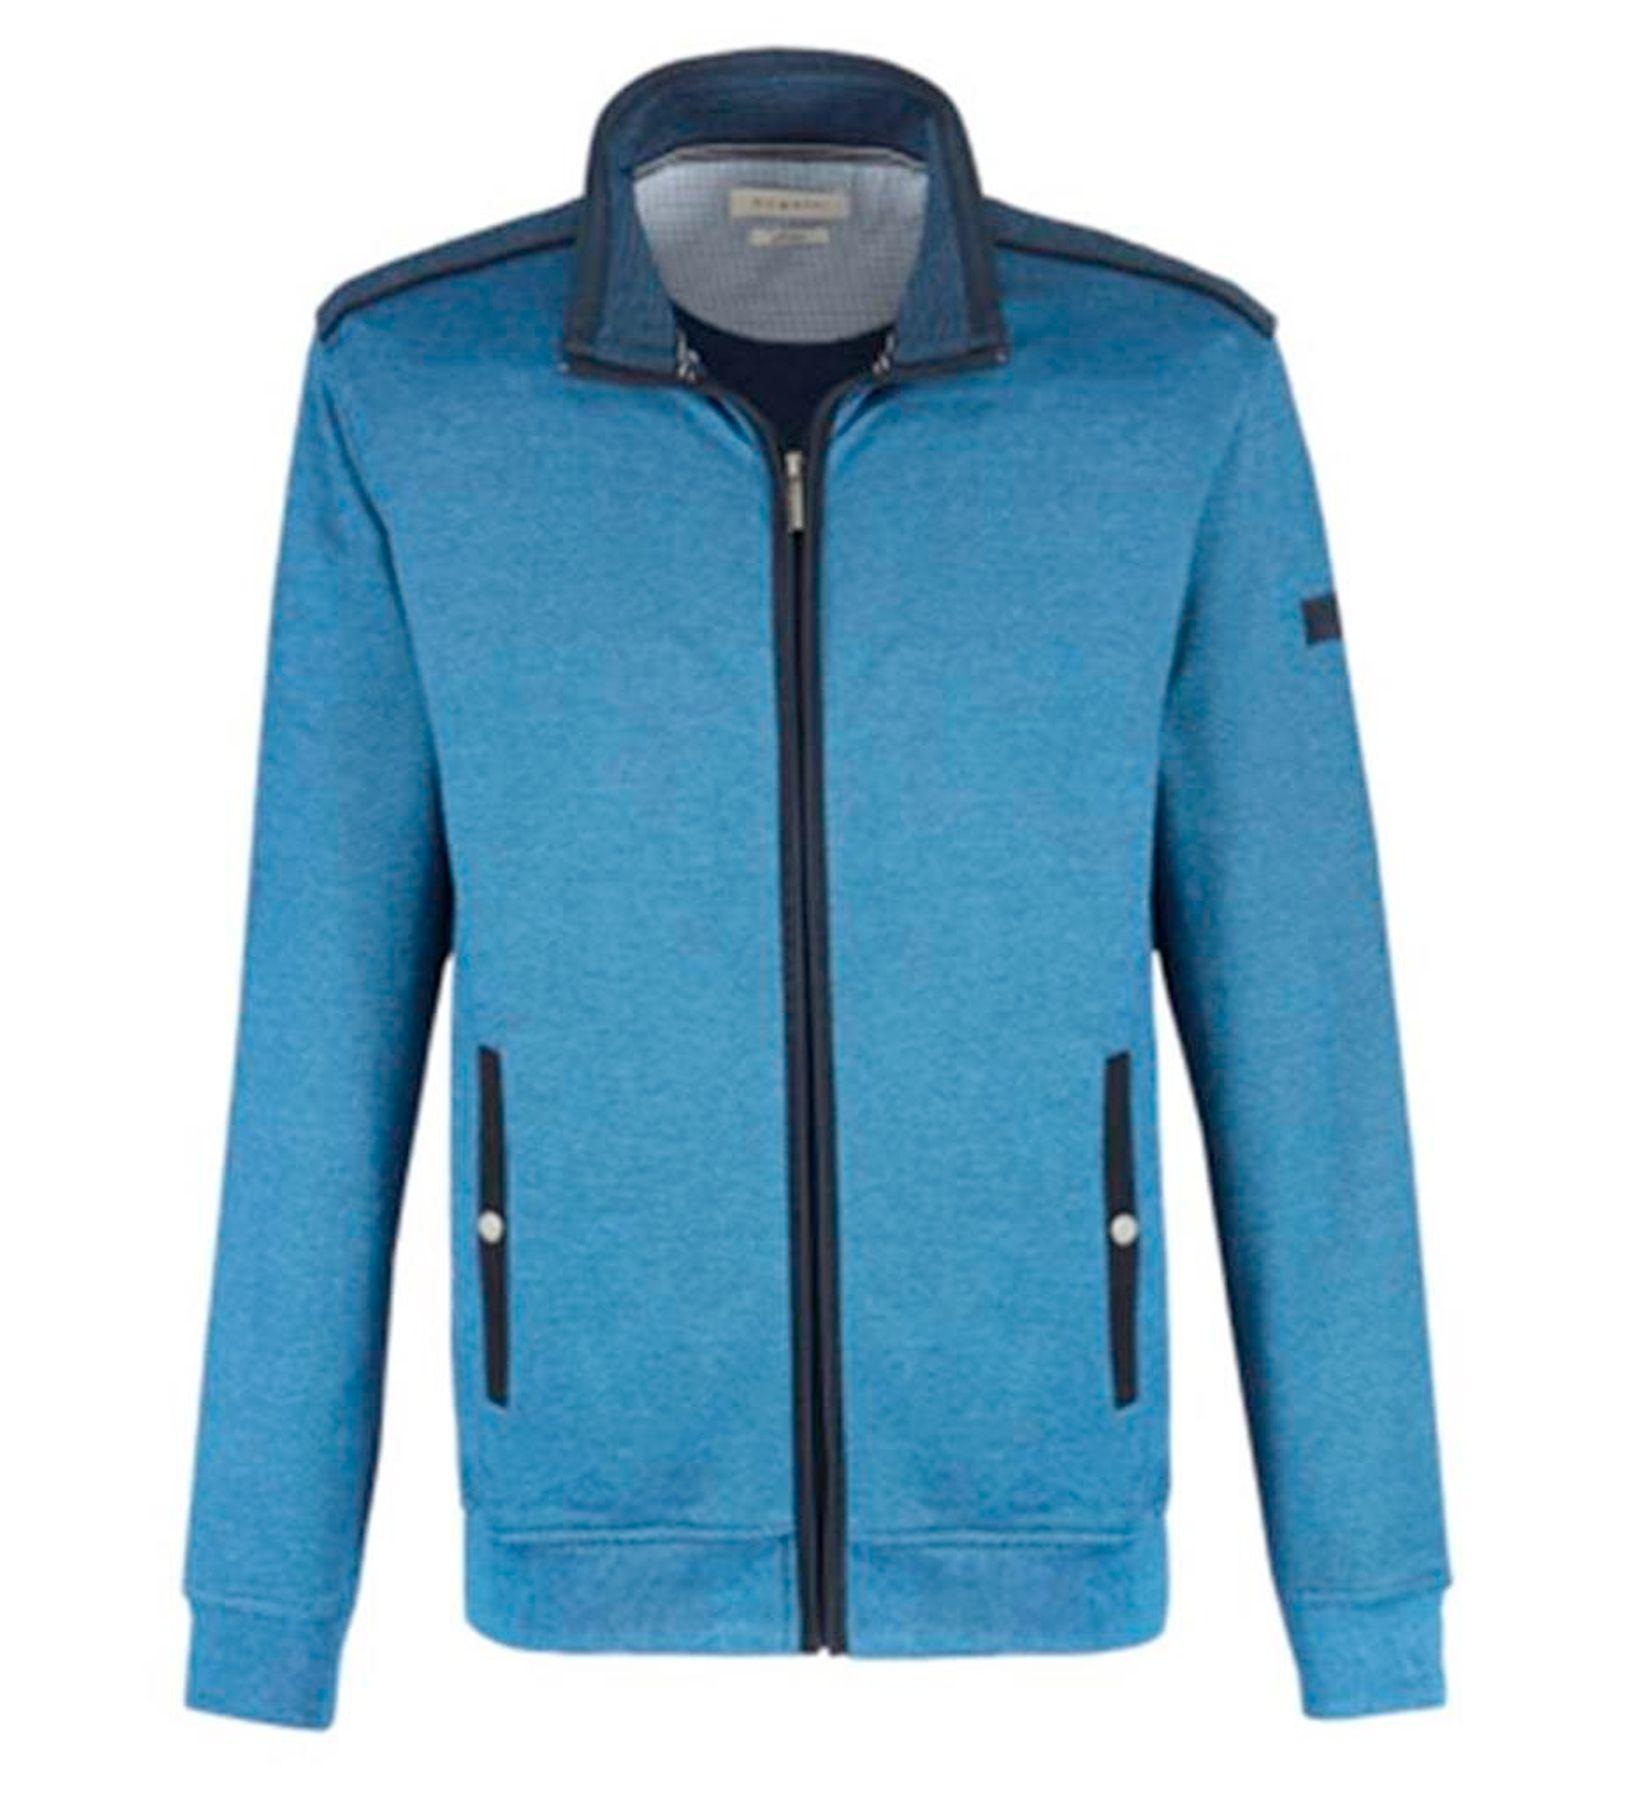 Bugatti - Herren Sweat Shirt Jacke (Art. Nr. 95140-8700)